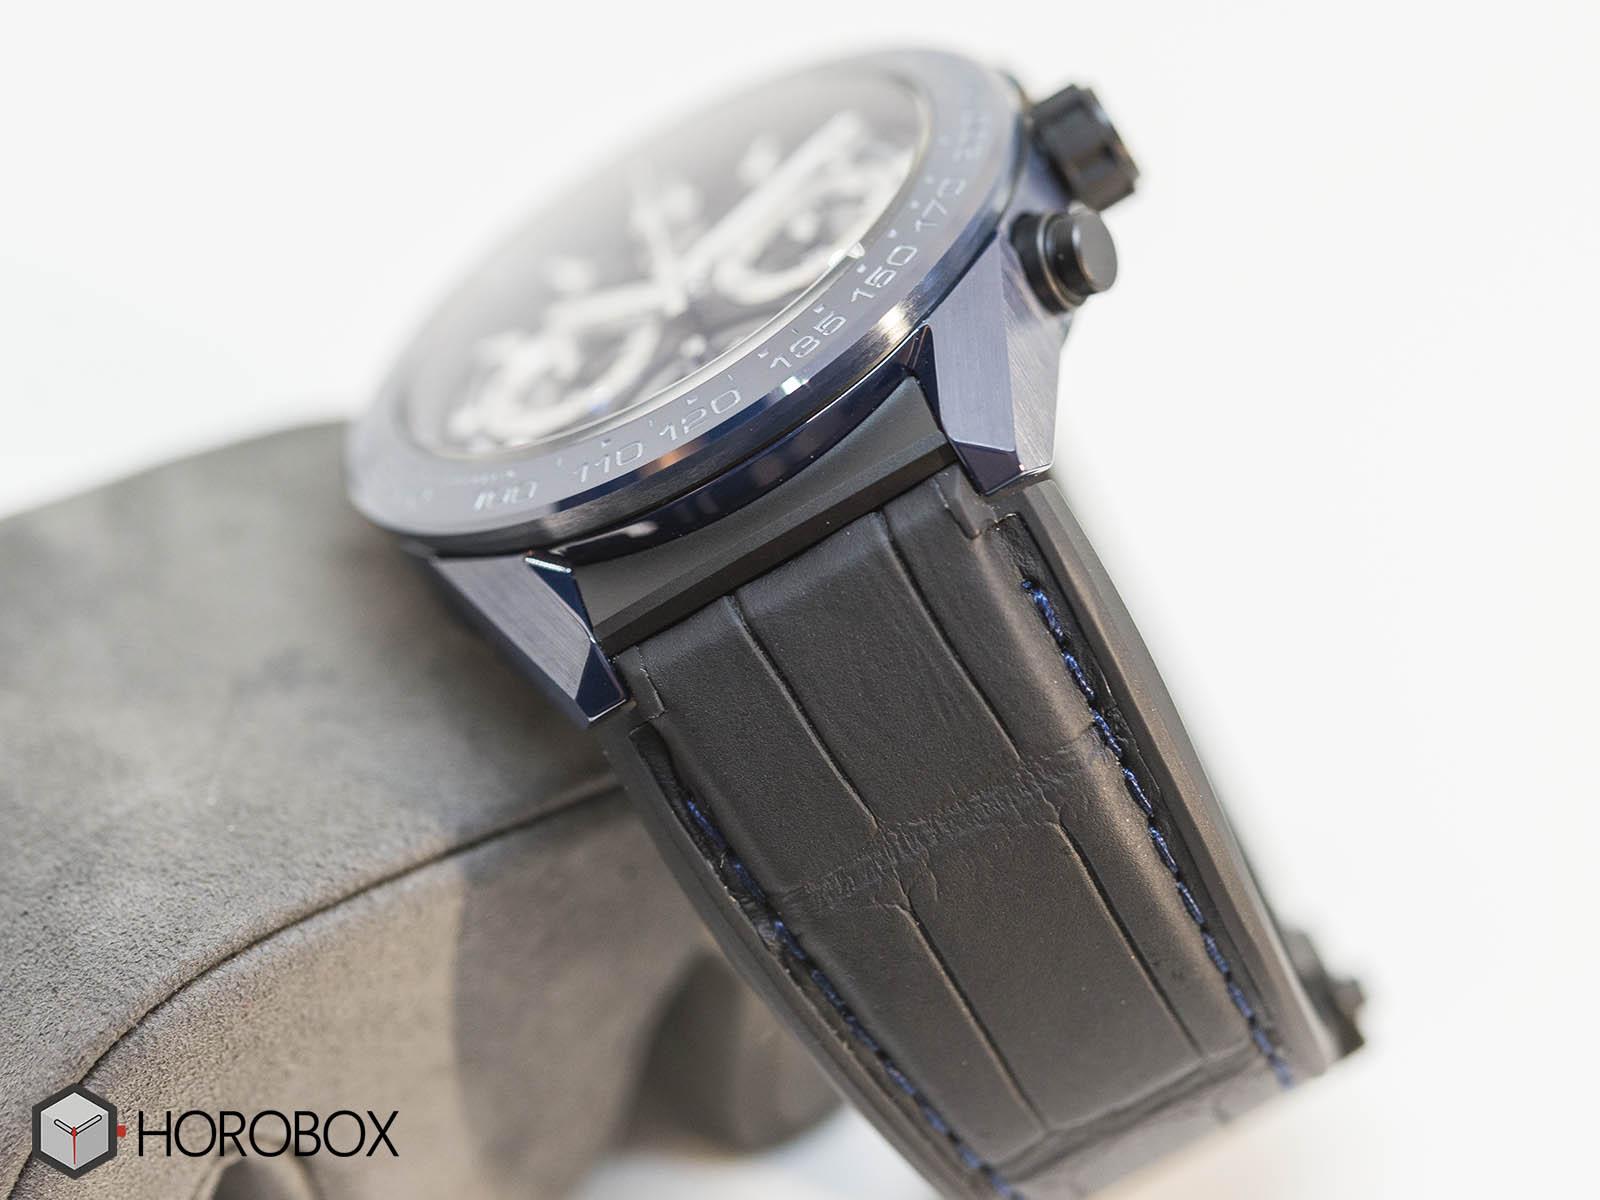 car5a93-fc6442-tag-heuer-carrera-chronograph-tourbillon-chronometer-7.jpg